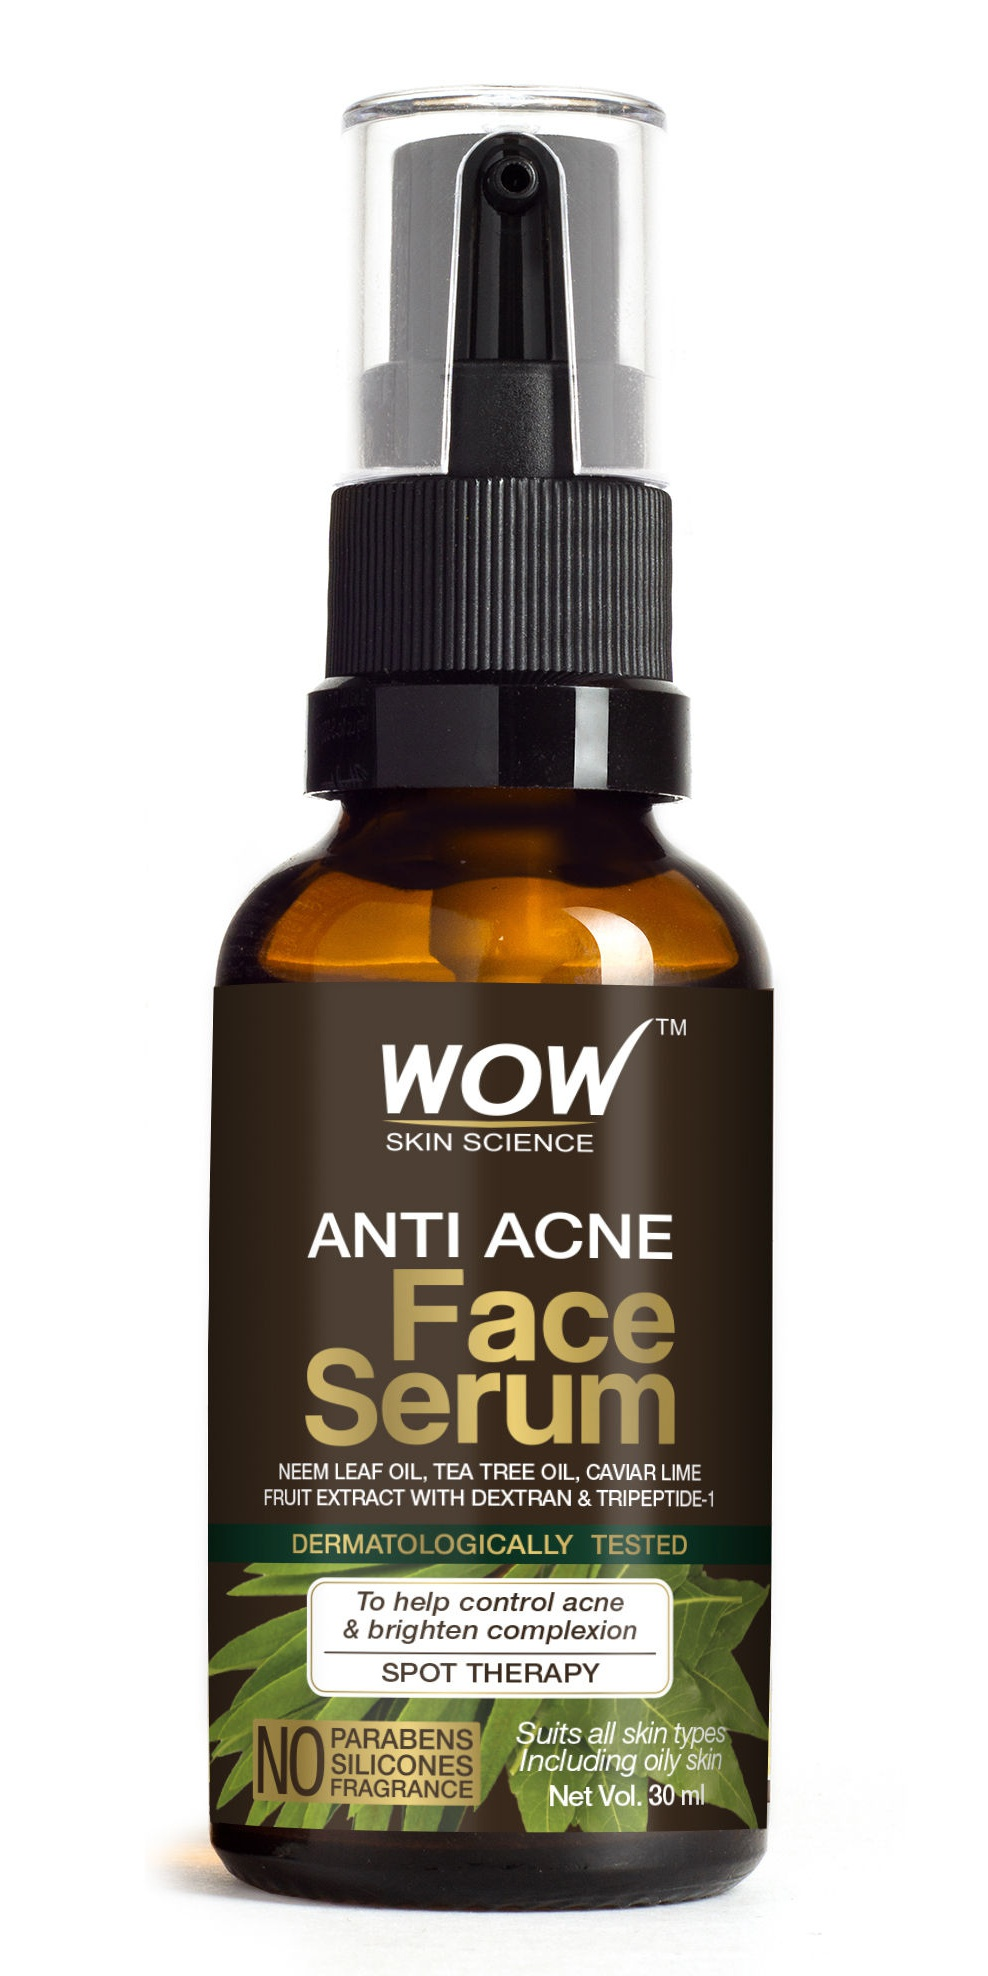 WOW skin science Anti Acne Face Serum